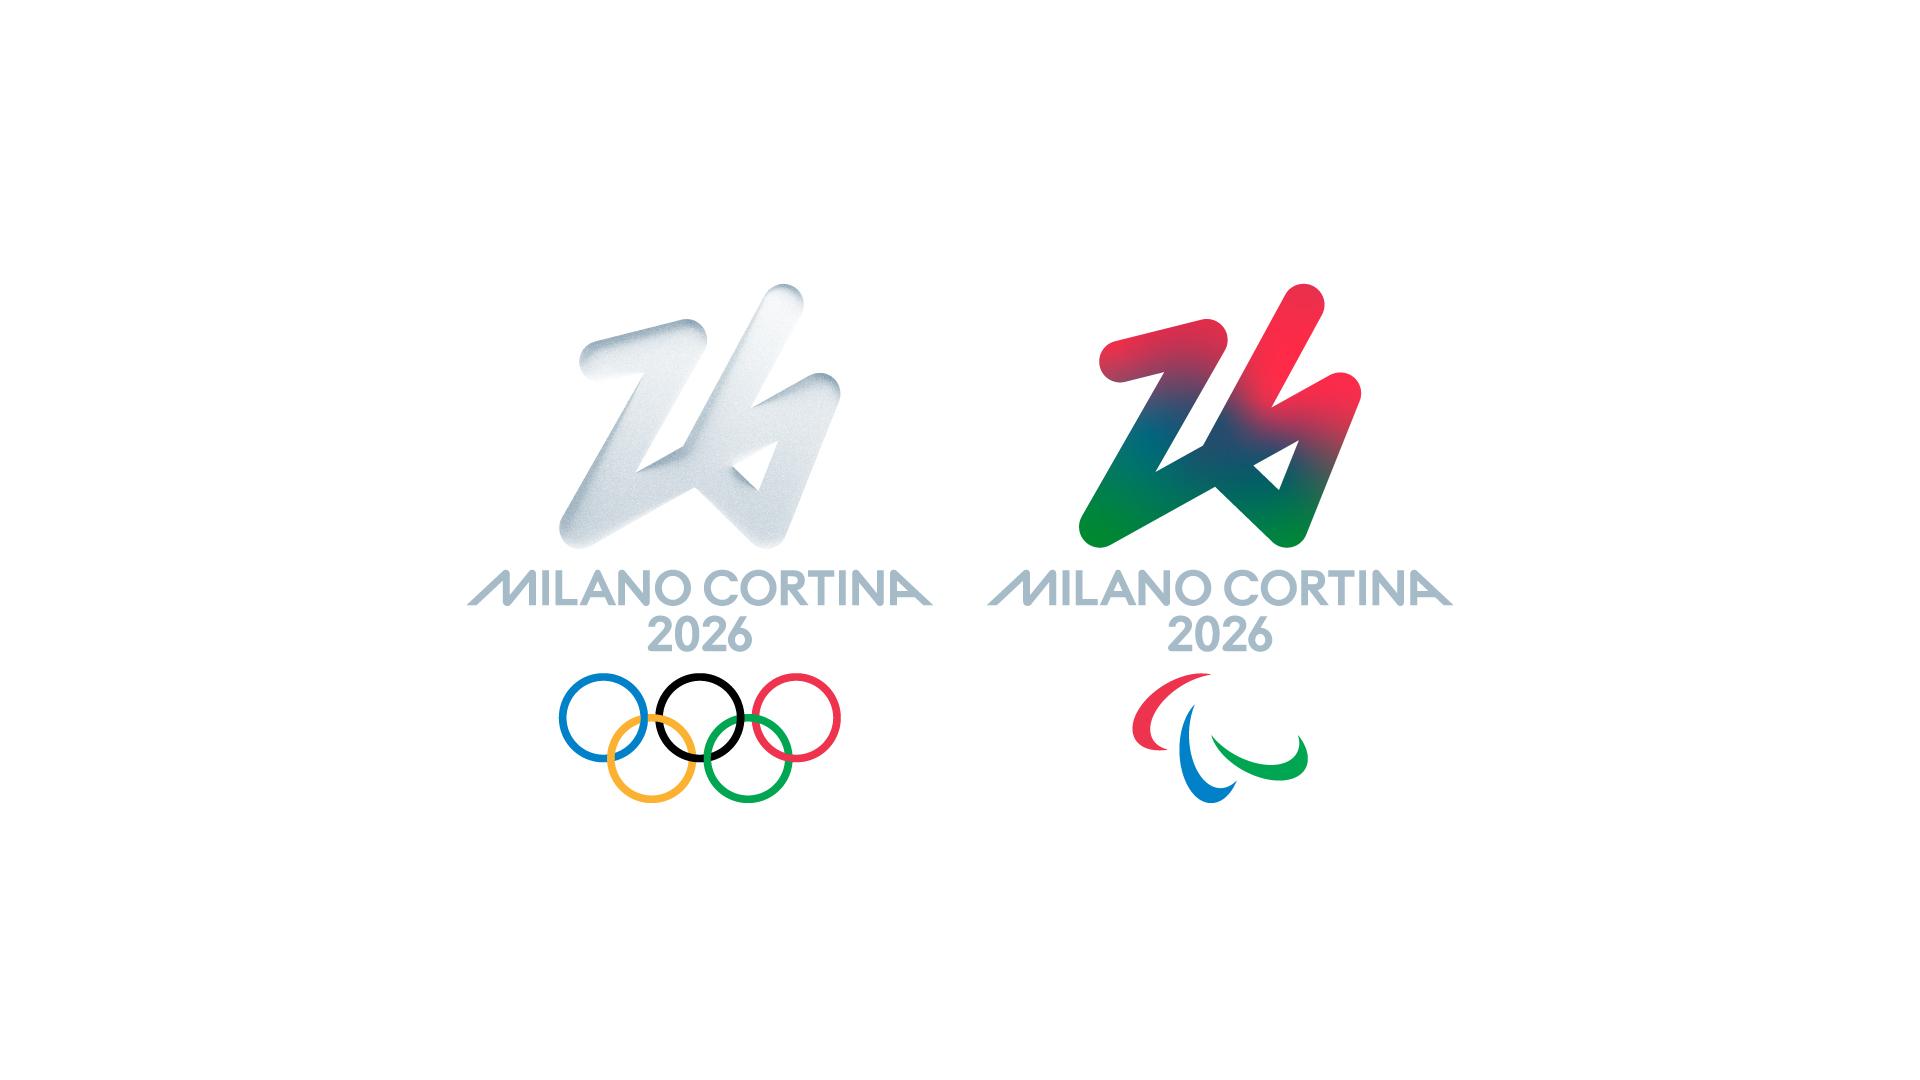 MilanCortina2026